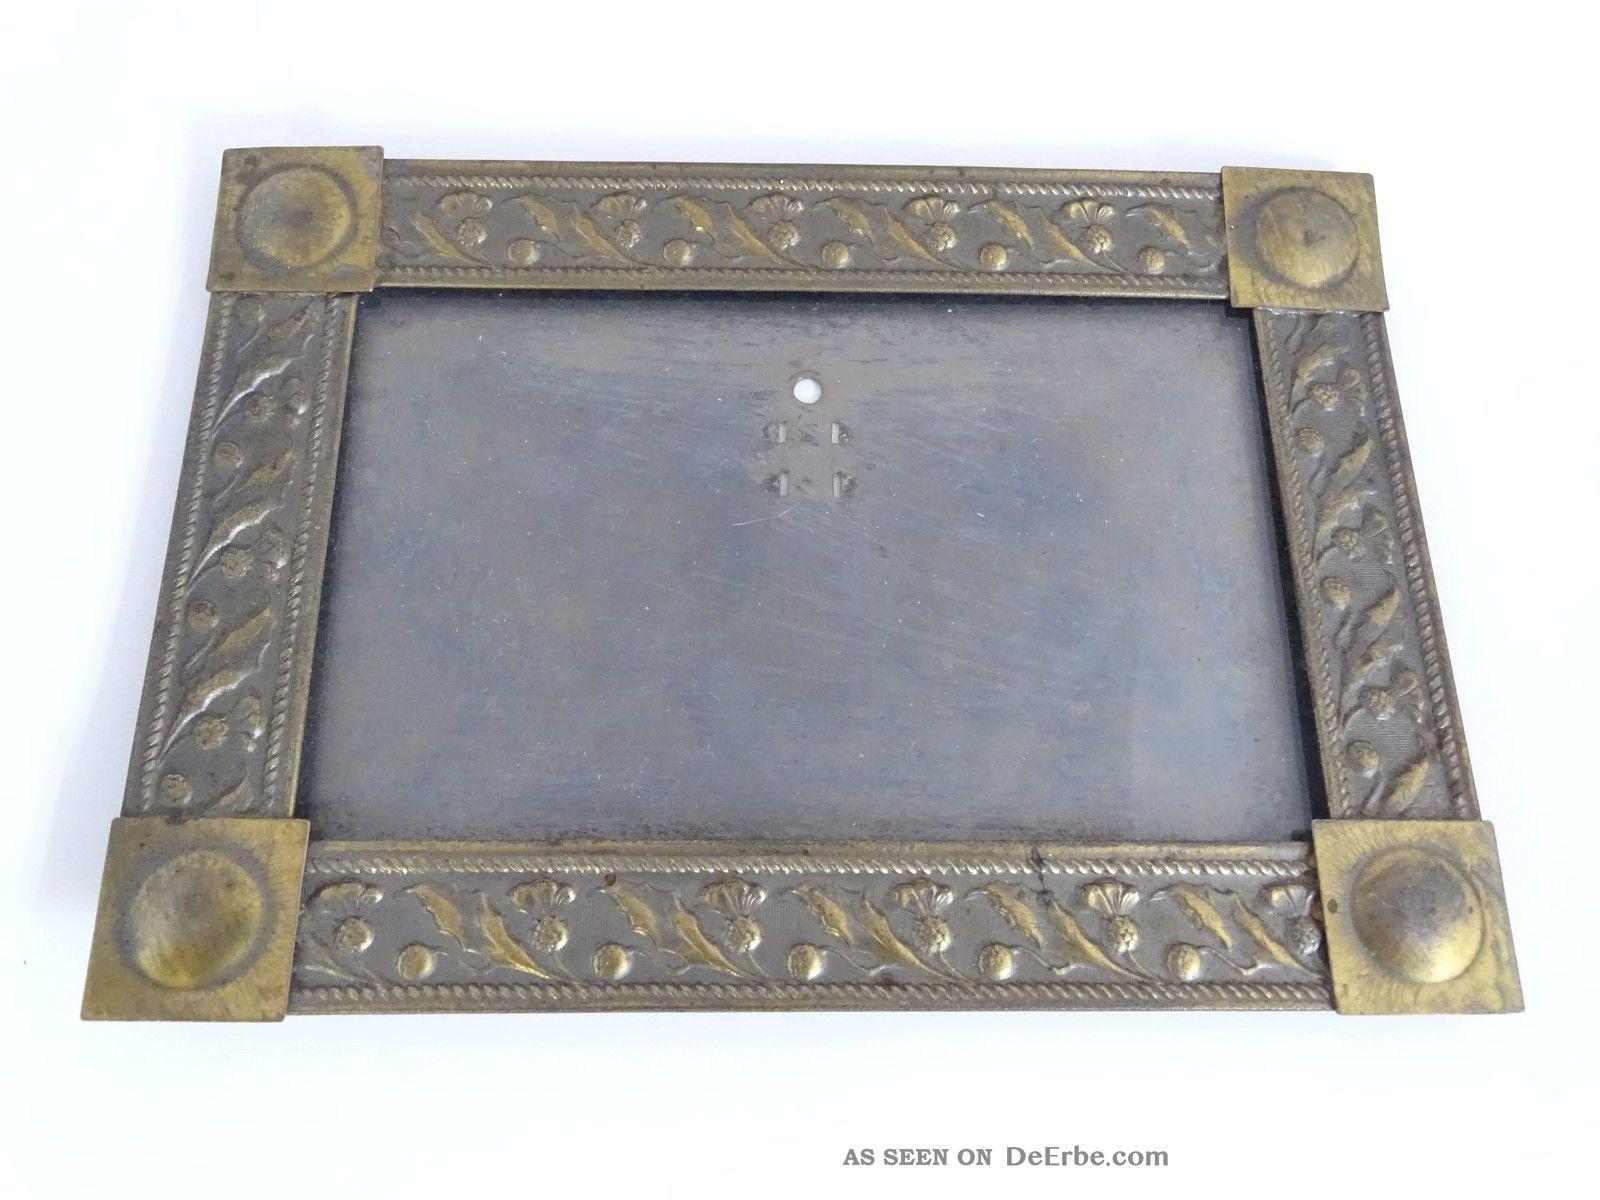 Antiker Jugendstil Bilderrahmen Aus Metall Bilder Rahmen Picture Frame Rahmen Bild